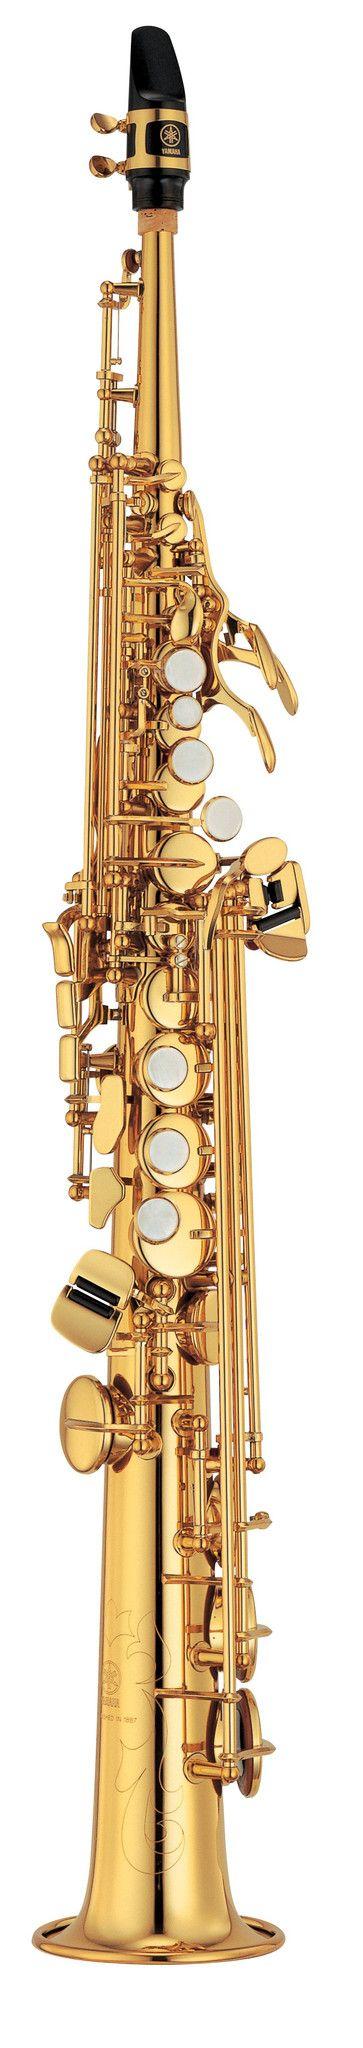 Yamaha YSS-475II Intermediate Series Soprano Saxophone